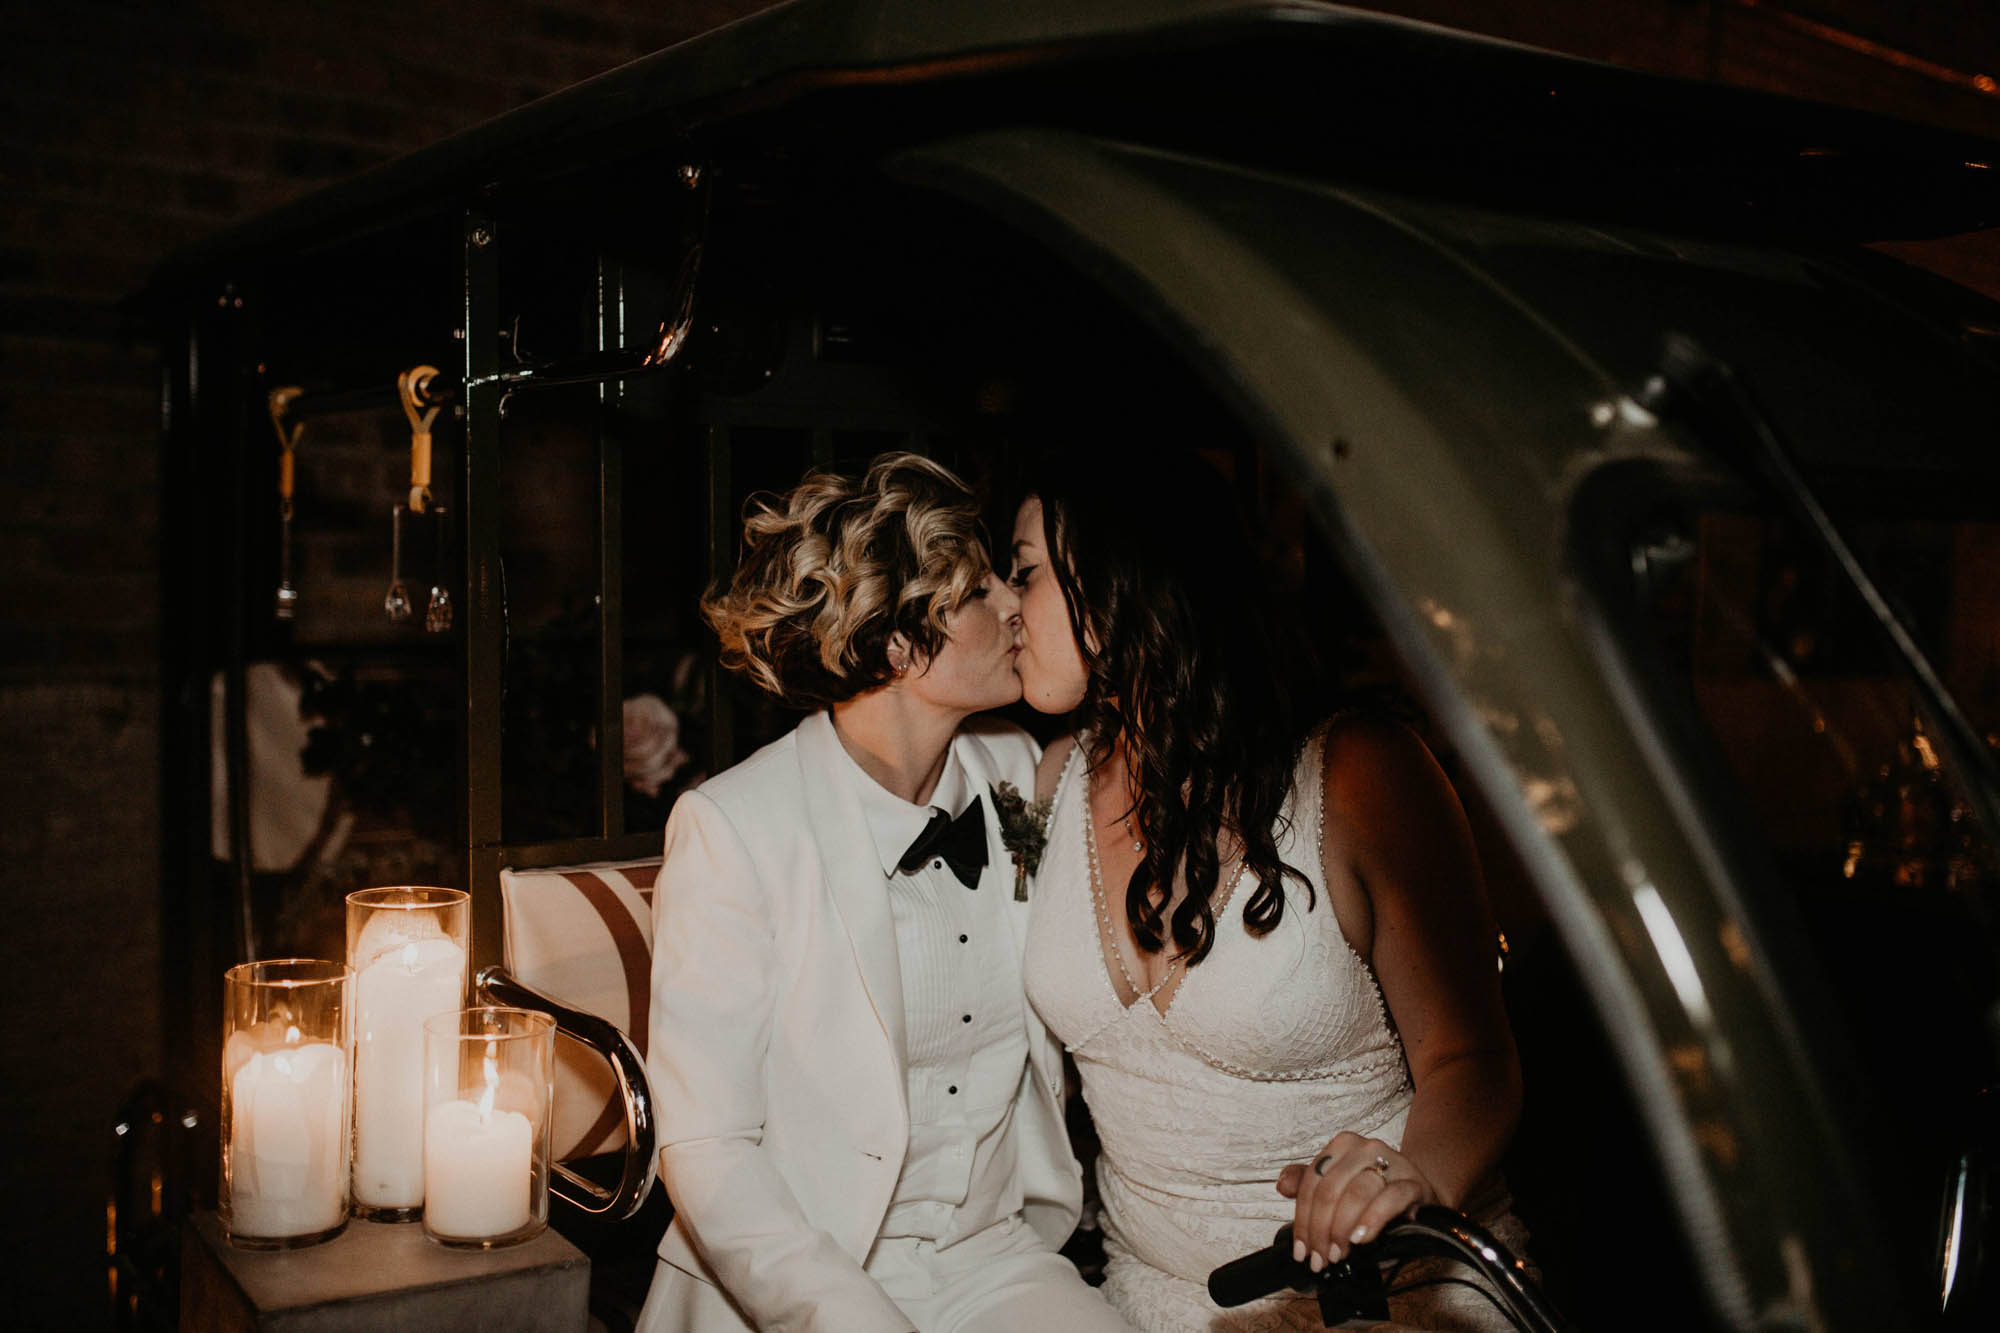 Vintage Inspired Modern Wedding - Chicago - Same-Sex Wedding Inspiration